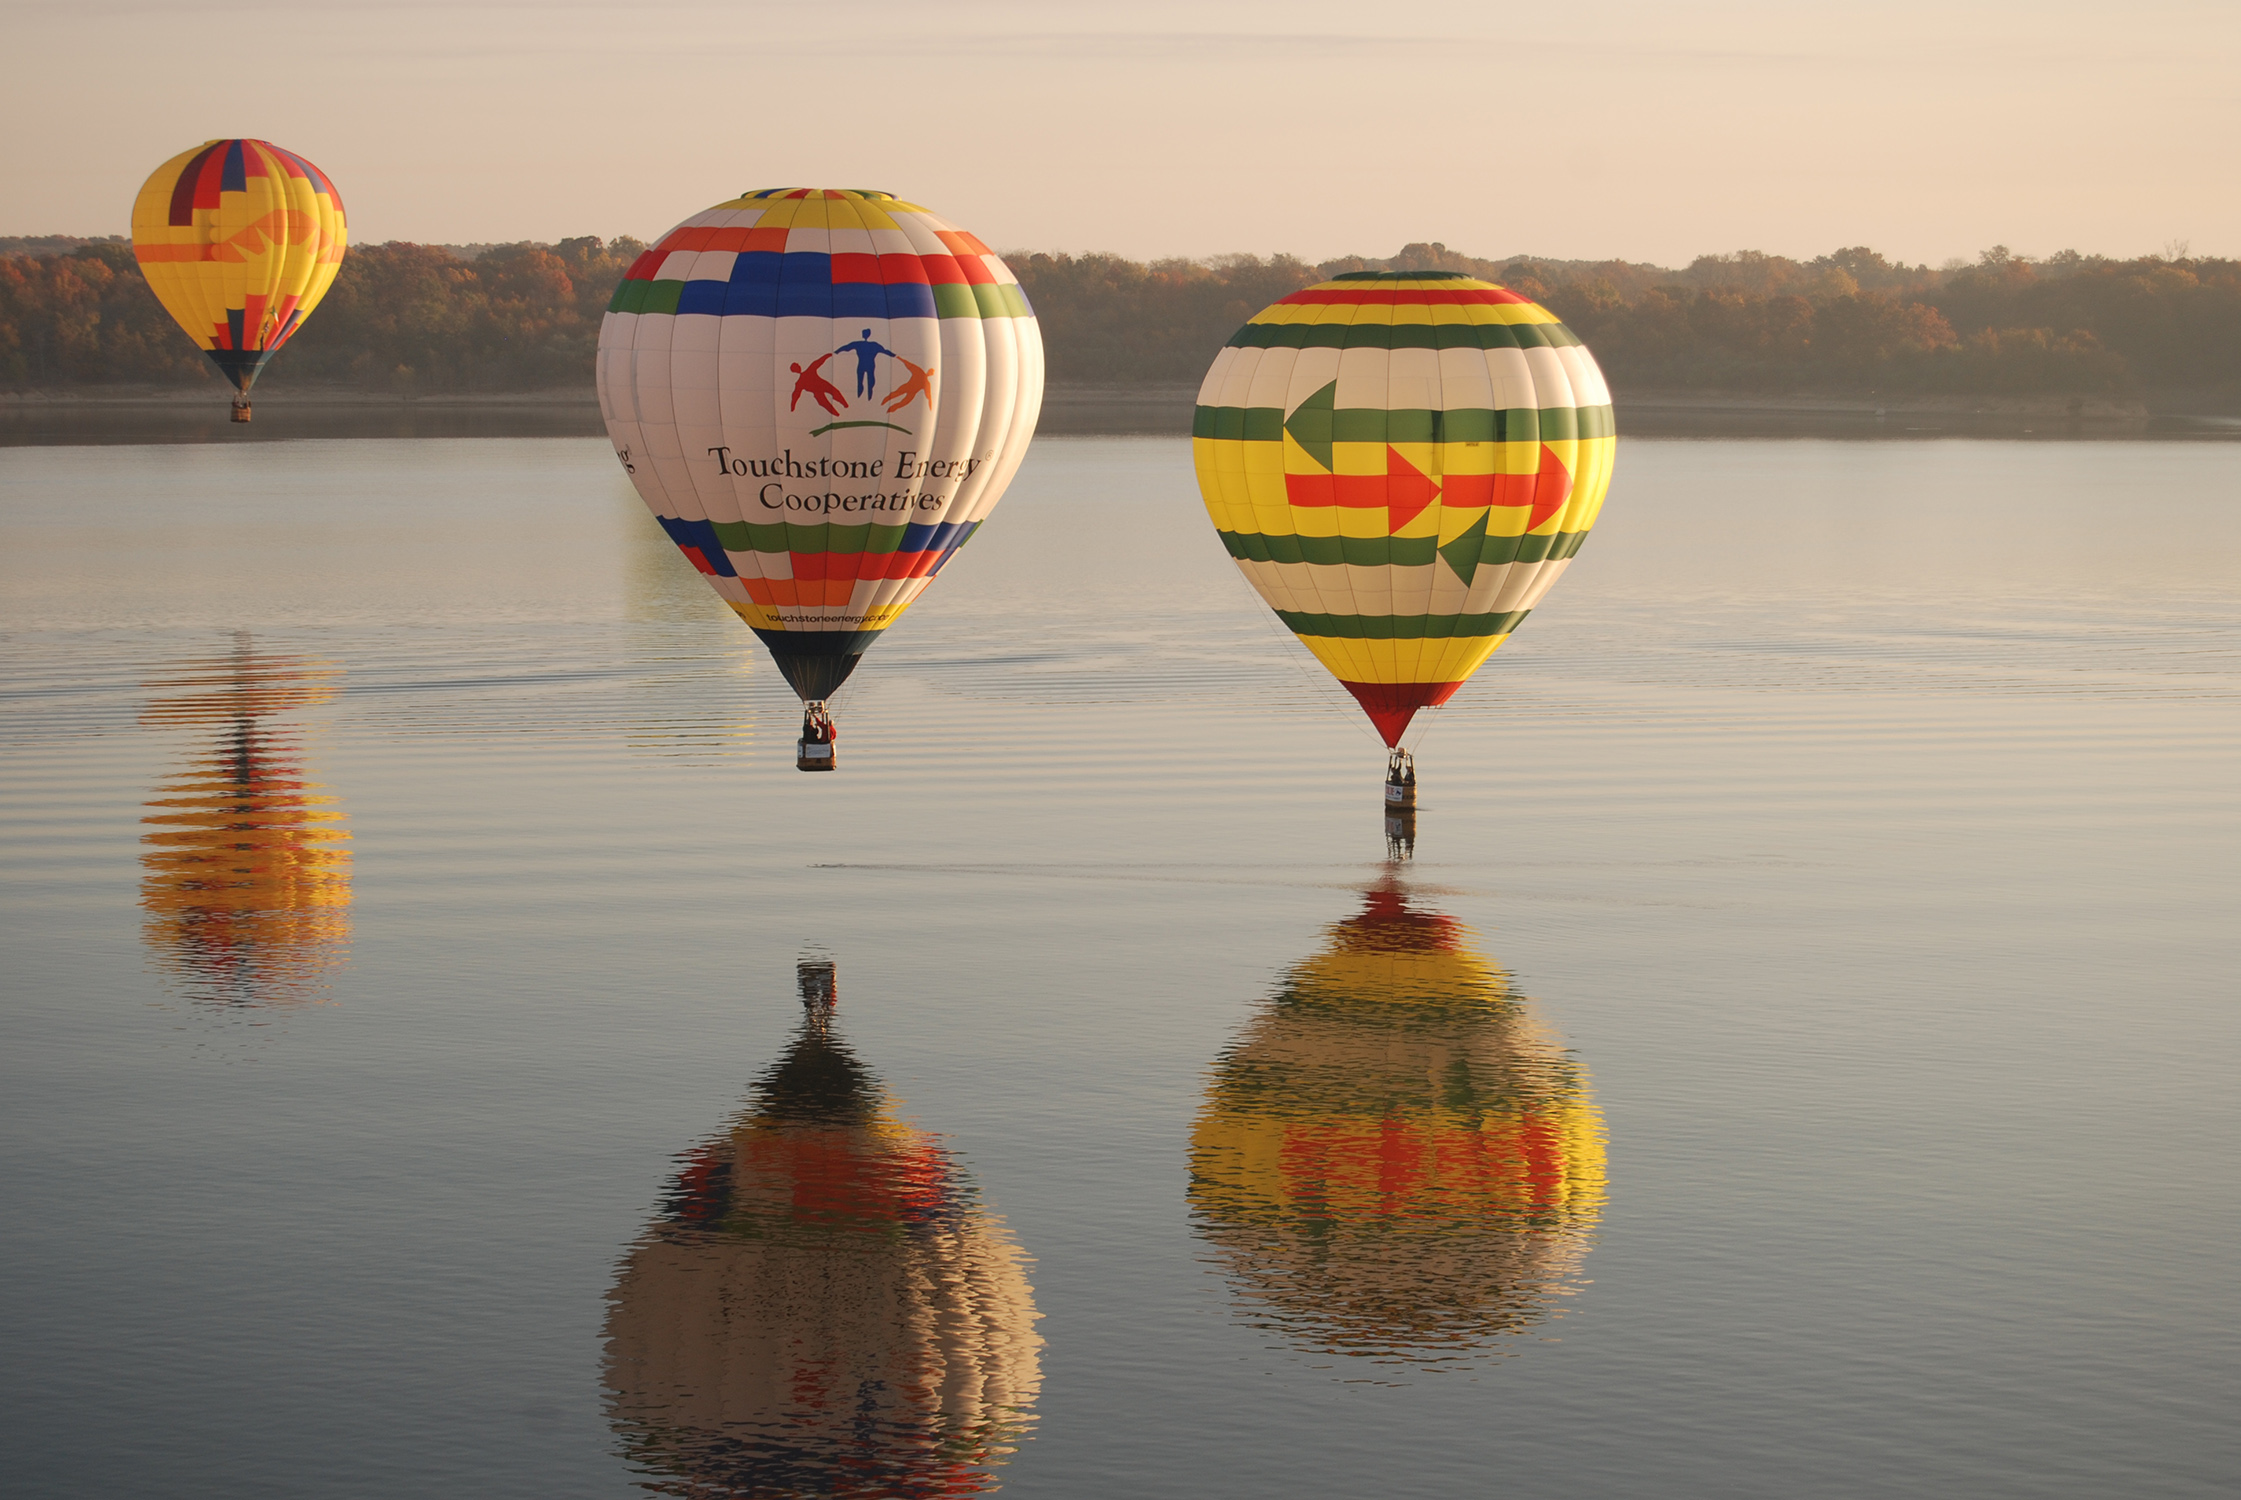 https://cbaballoon.com/sites/cbaballoon/files/revslider/image/balloons%20over%20water.JPG